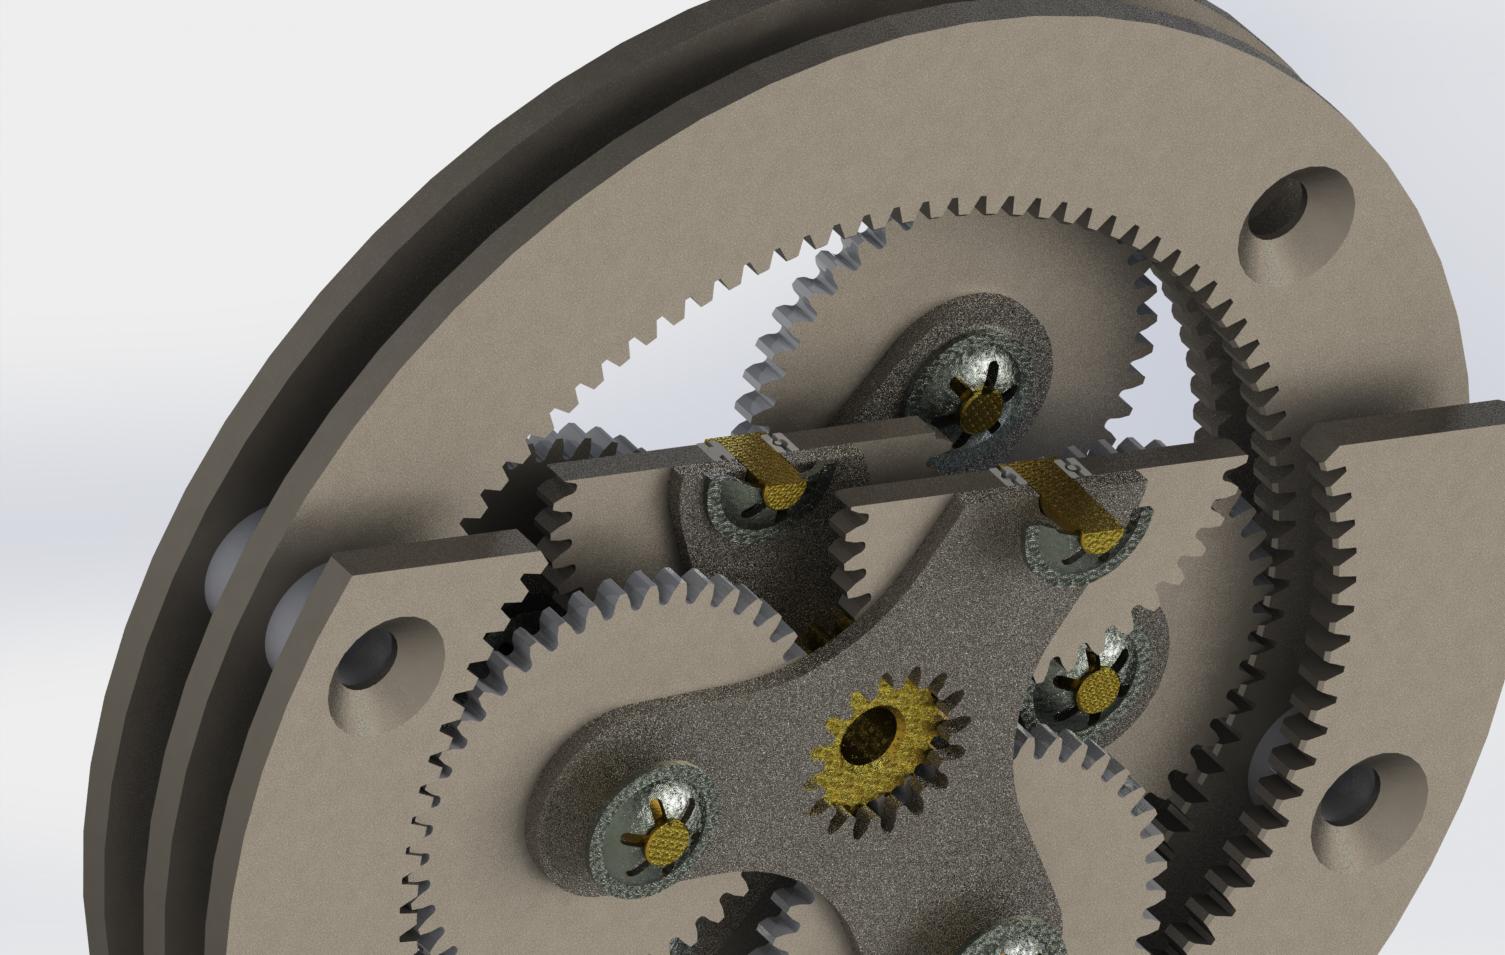 planetary gear setup行星齿轮传动箱3D图纸 STP格式